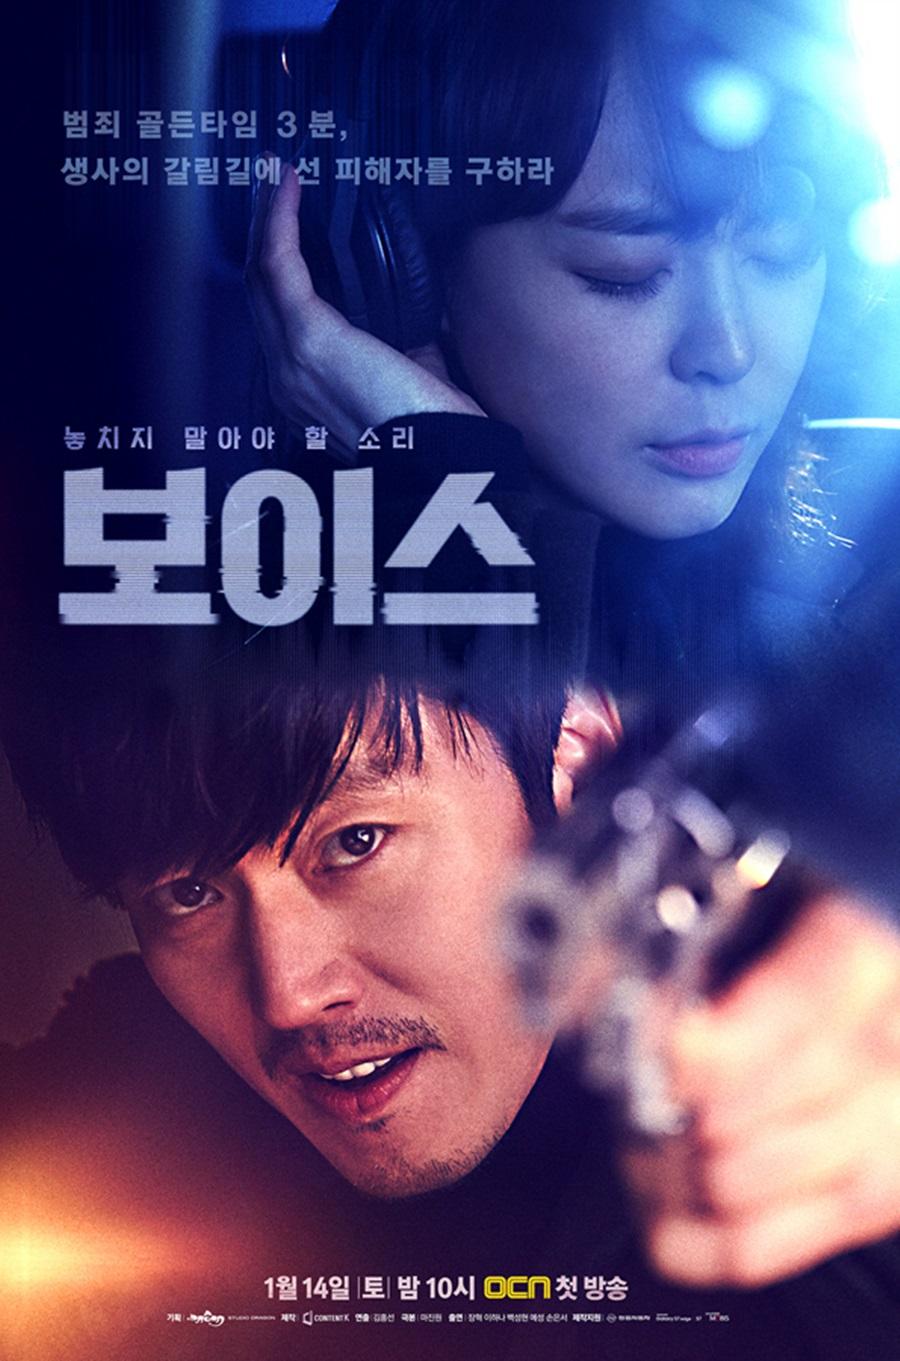 Nonton Drama Tunnel : nonton, drama, tunnel, REVIEW, DRAMA, KOREA], VOICE:, Pembunuhan, Psikopat, Azura